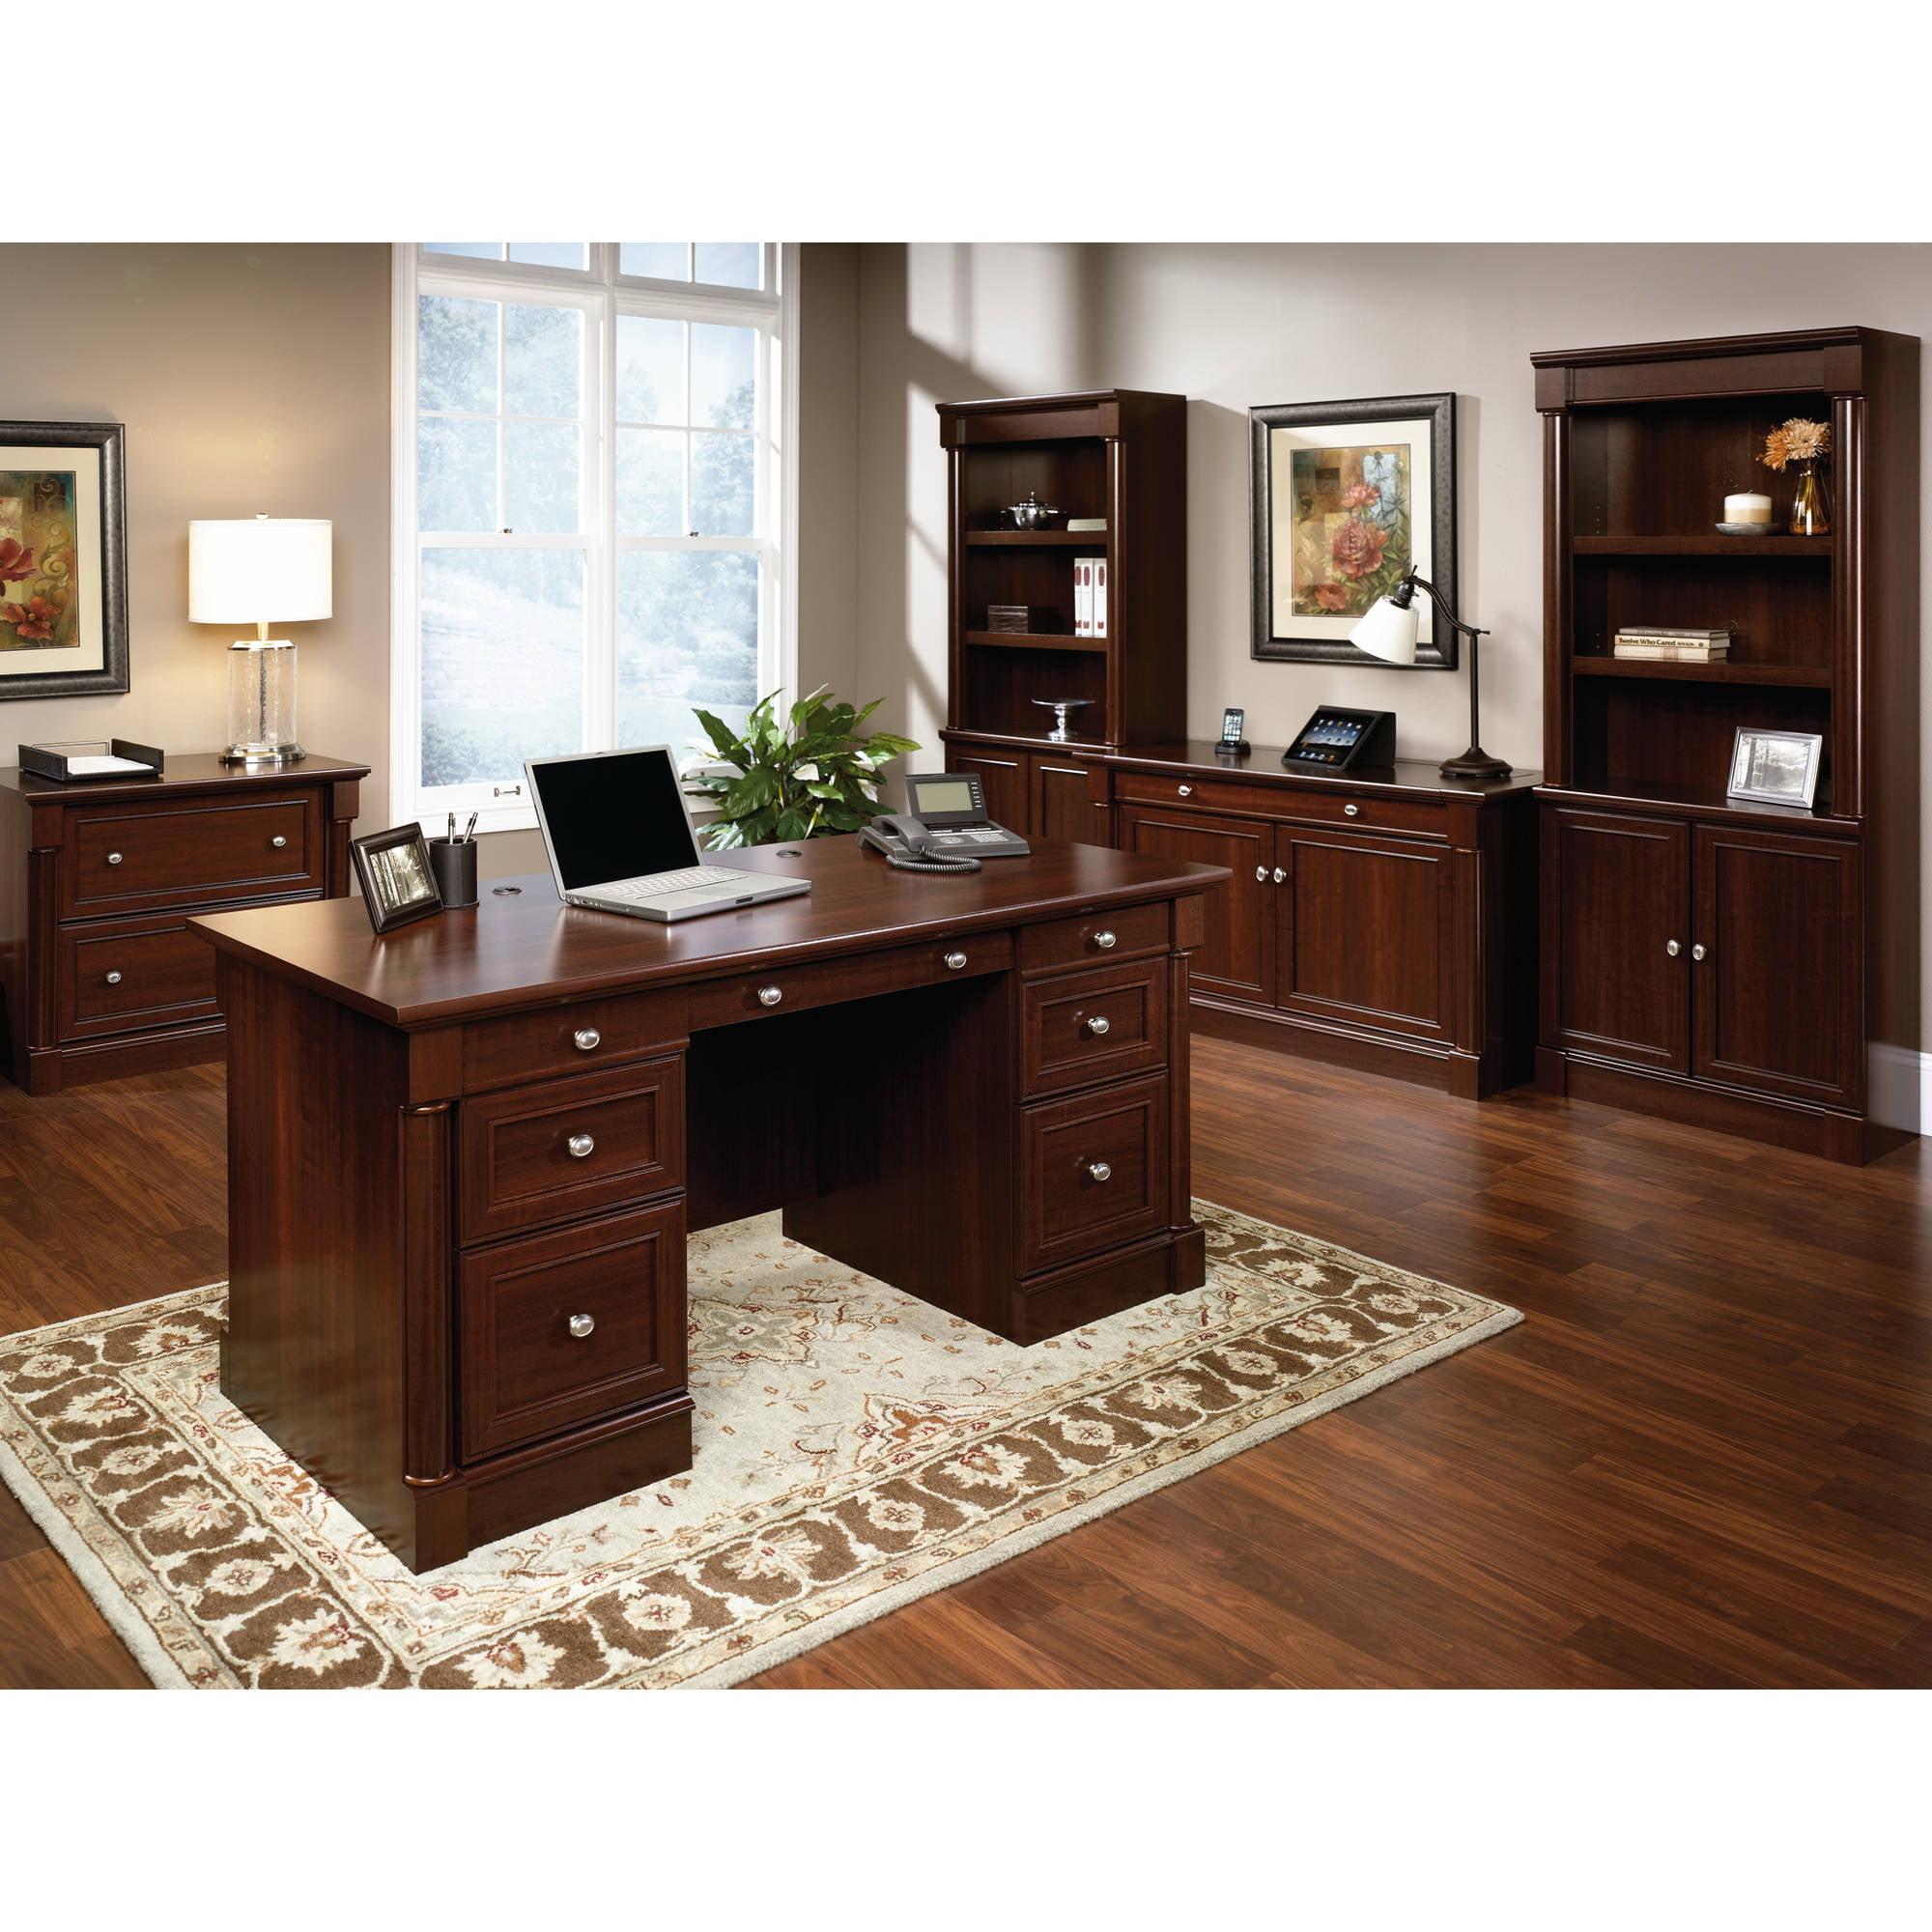 Sauder Palladia Executive Desk Select Cherry Finish Walmart Com